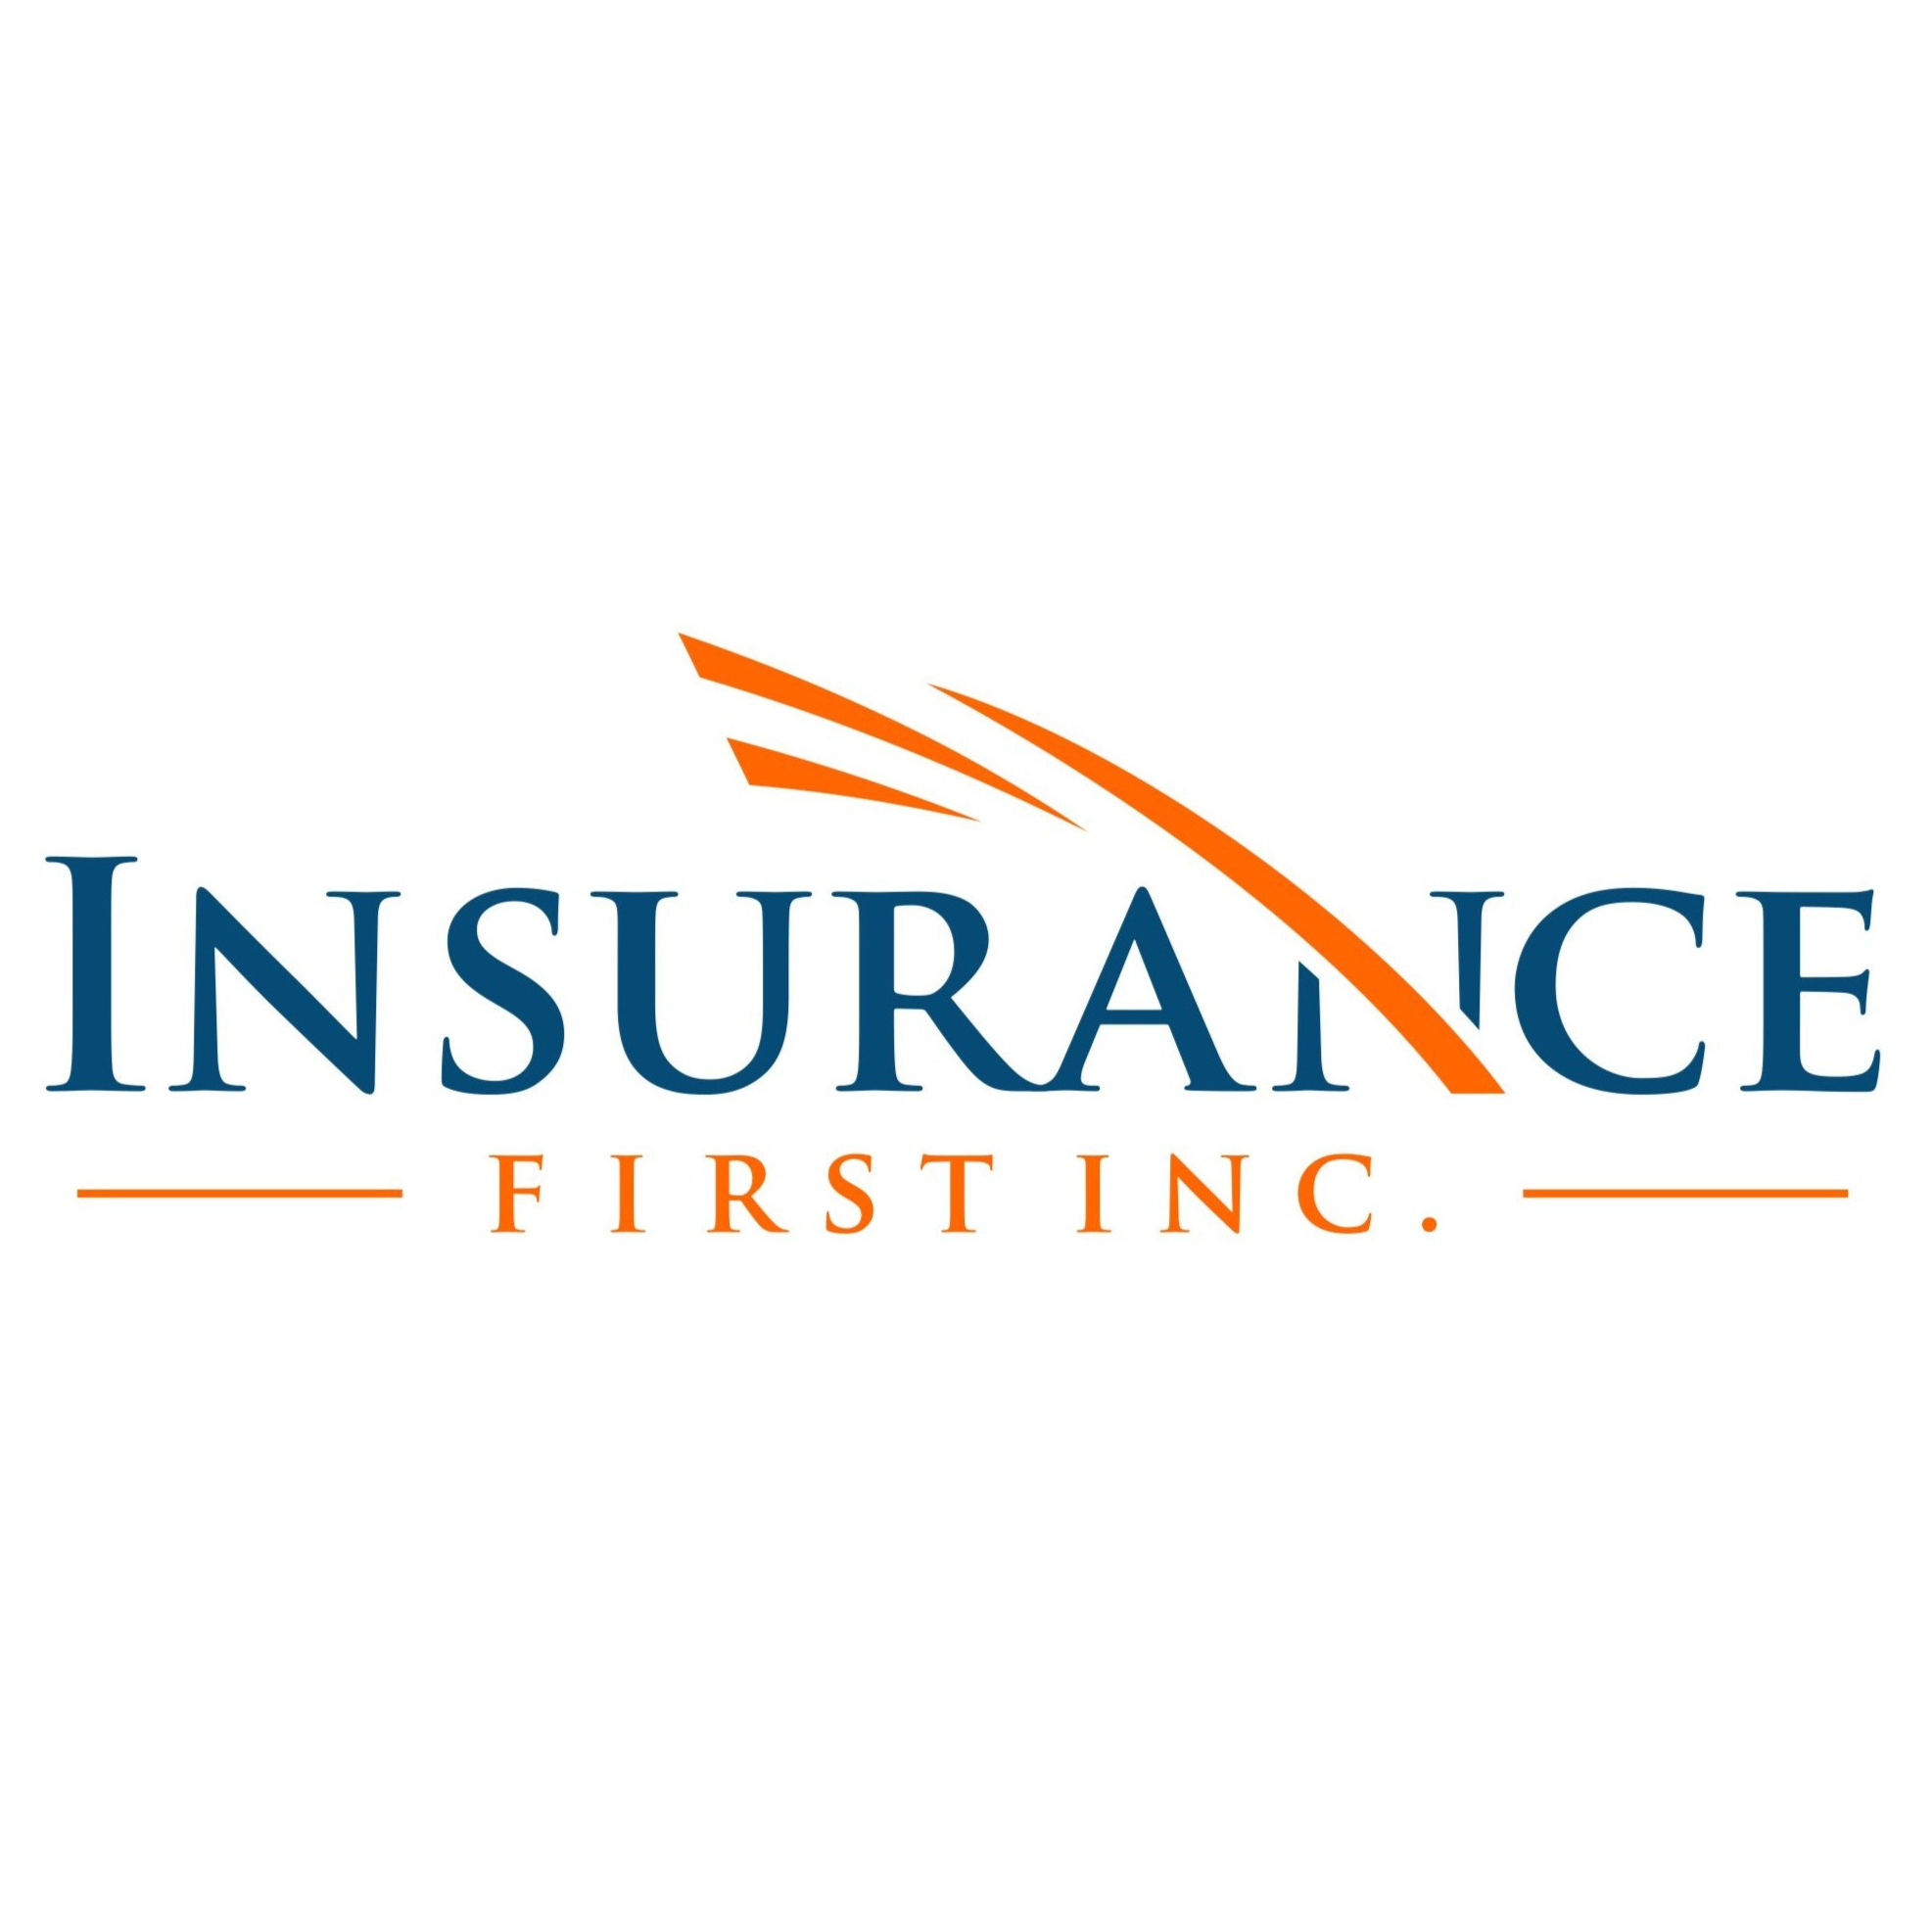 Insurance First